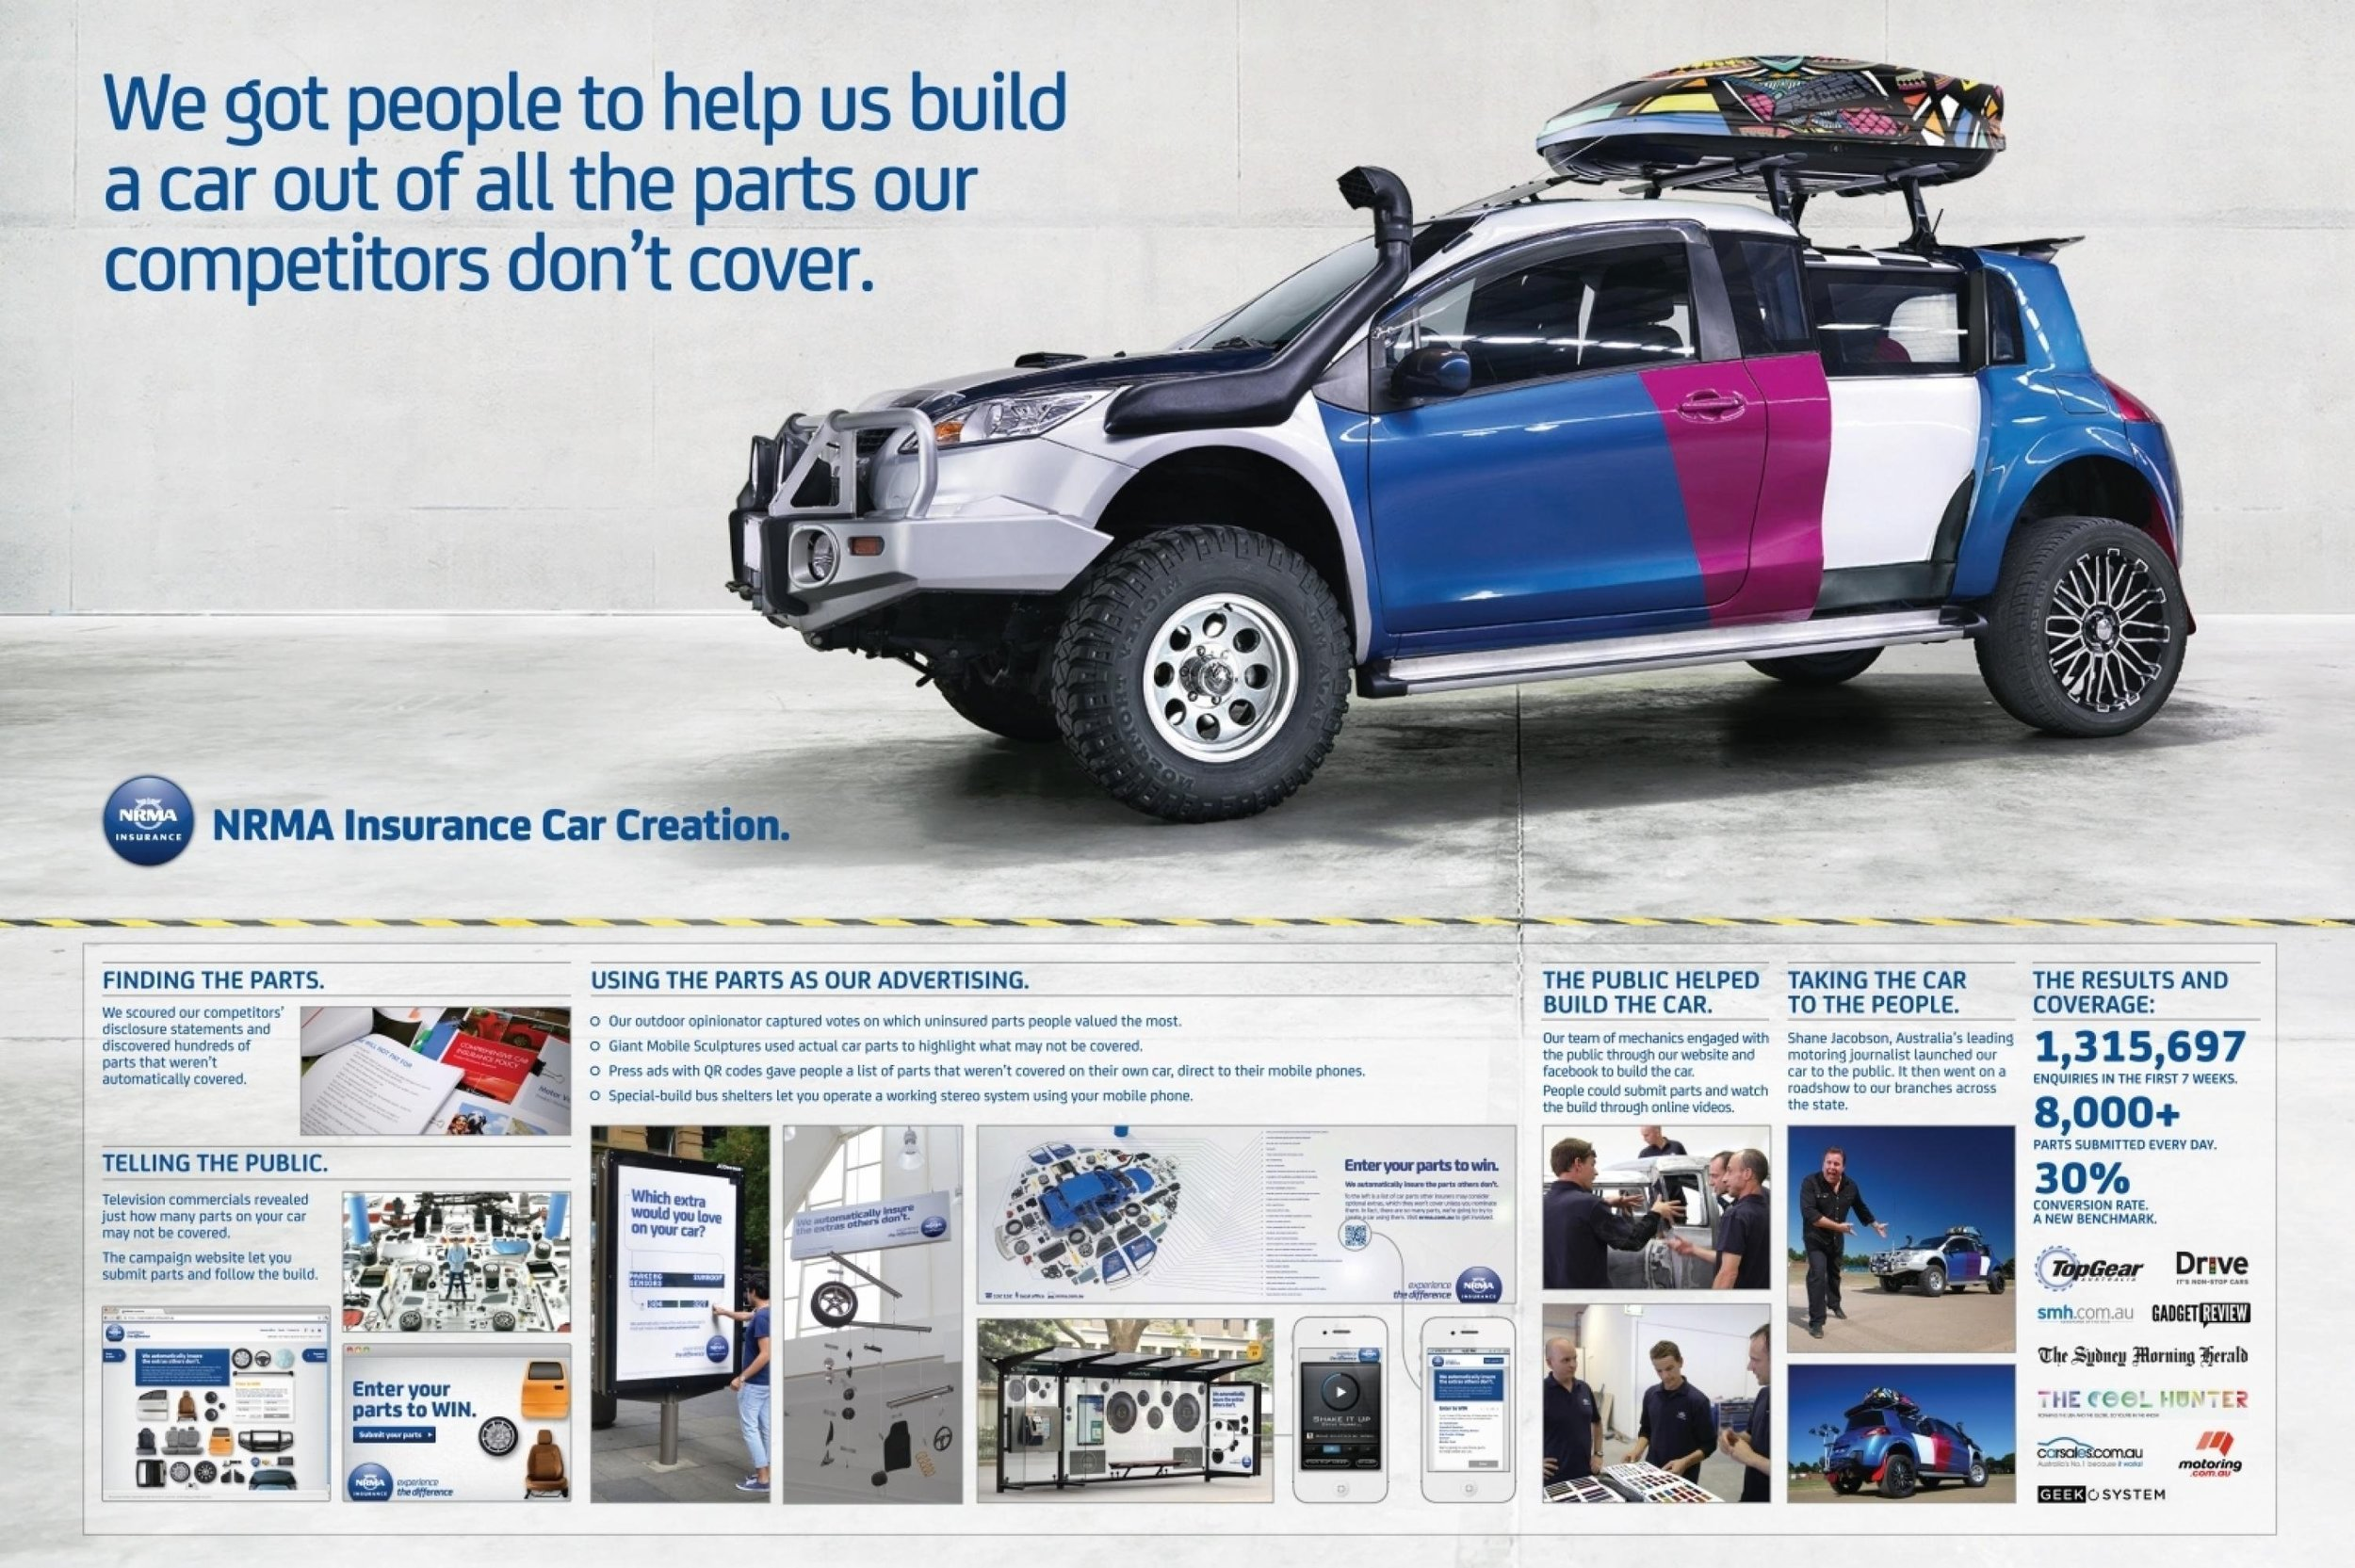 nrma-comprehensive-car-insurance-nrma-car-creation-image-2000-52178.jpg